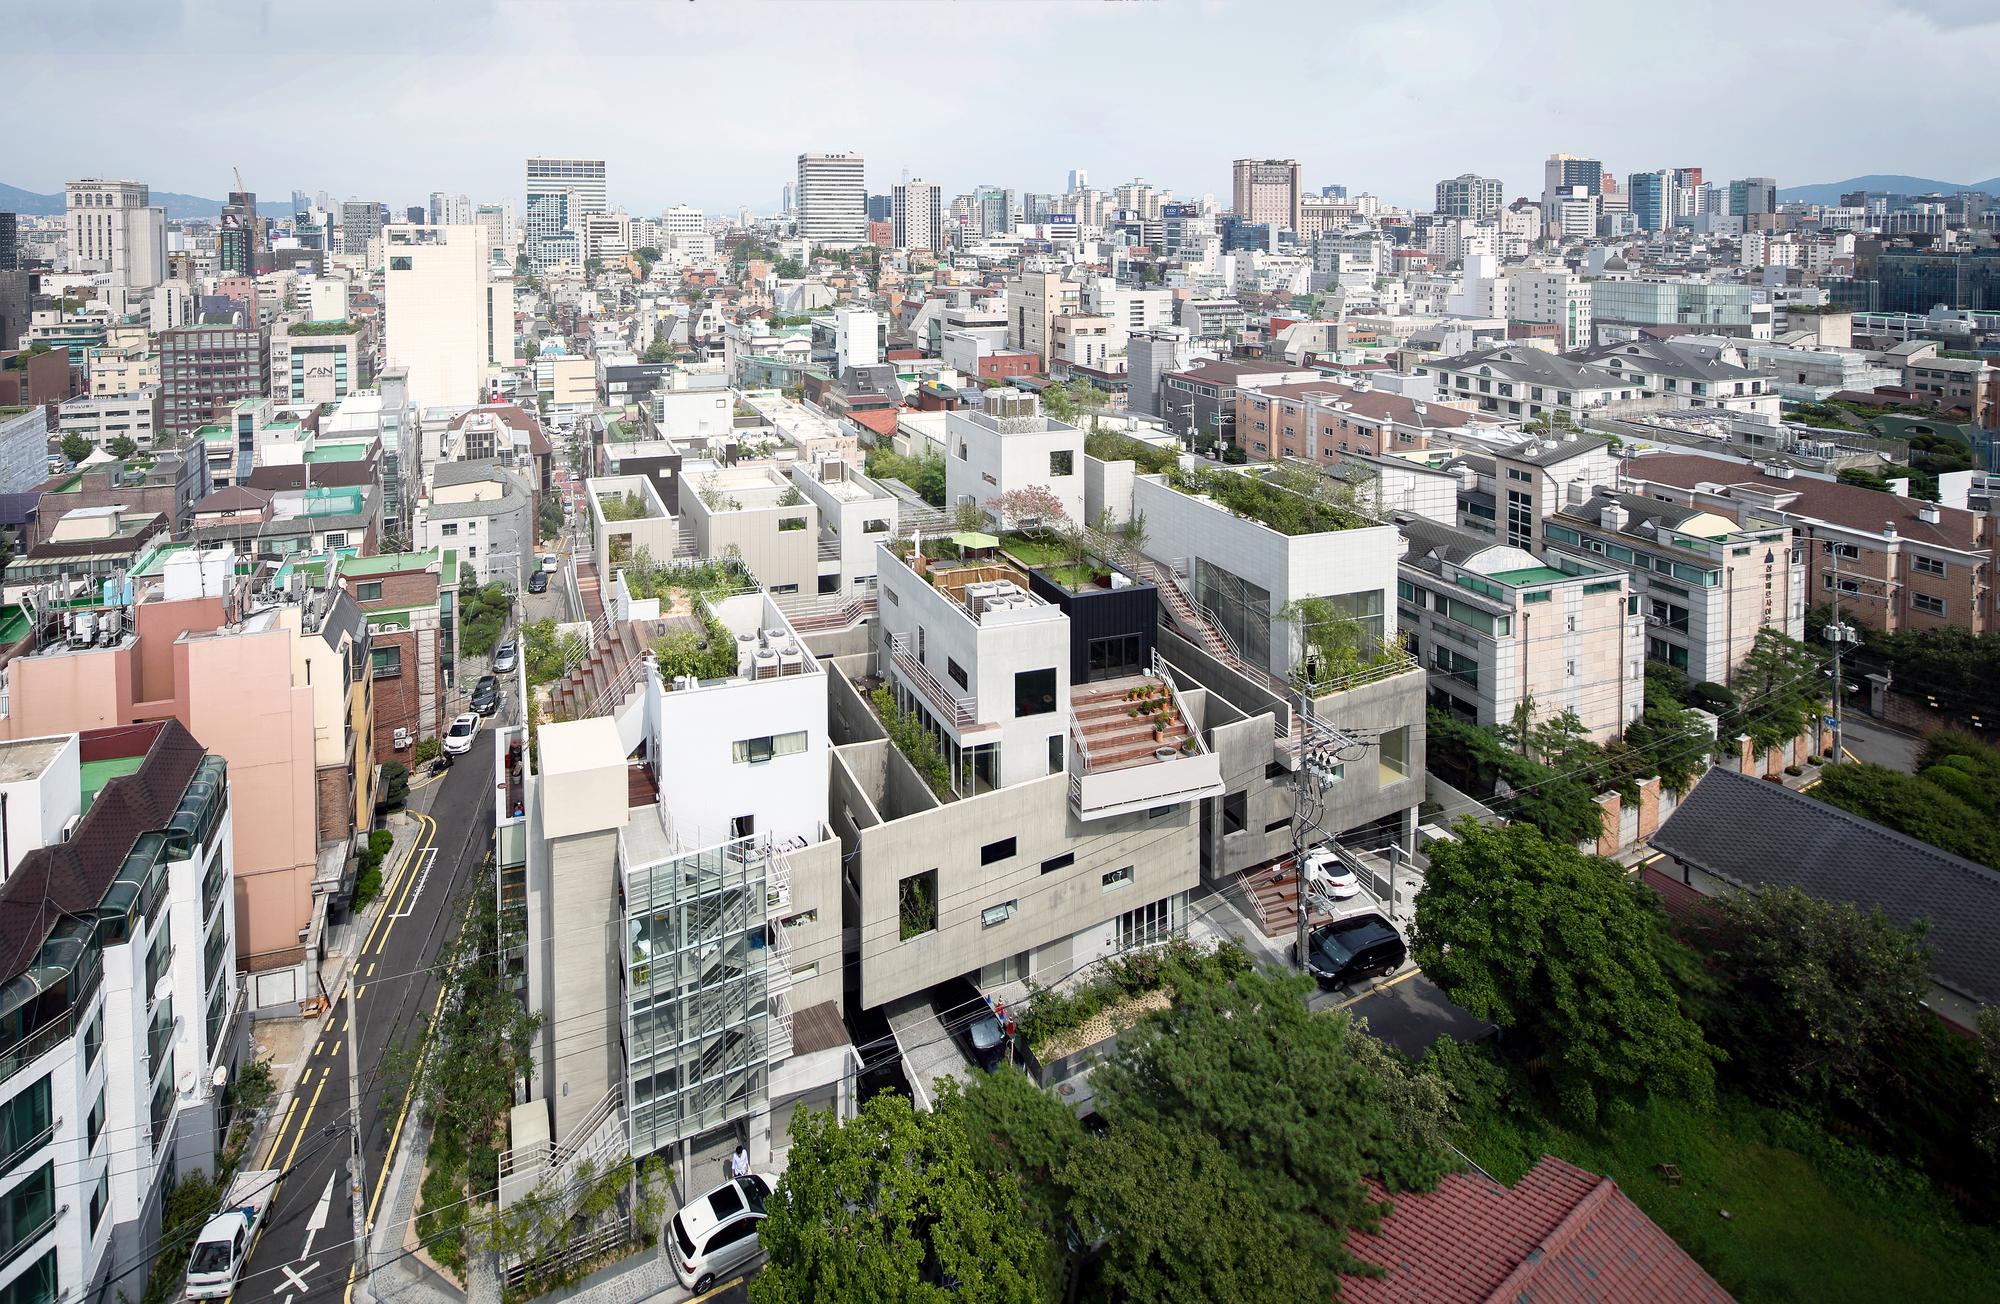 Young Joon Kim of Yo2 Architects on Rethinking Contemporary Seoul